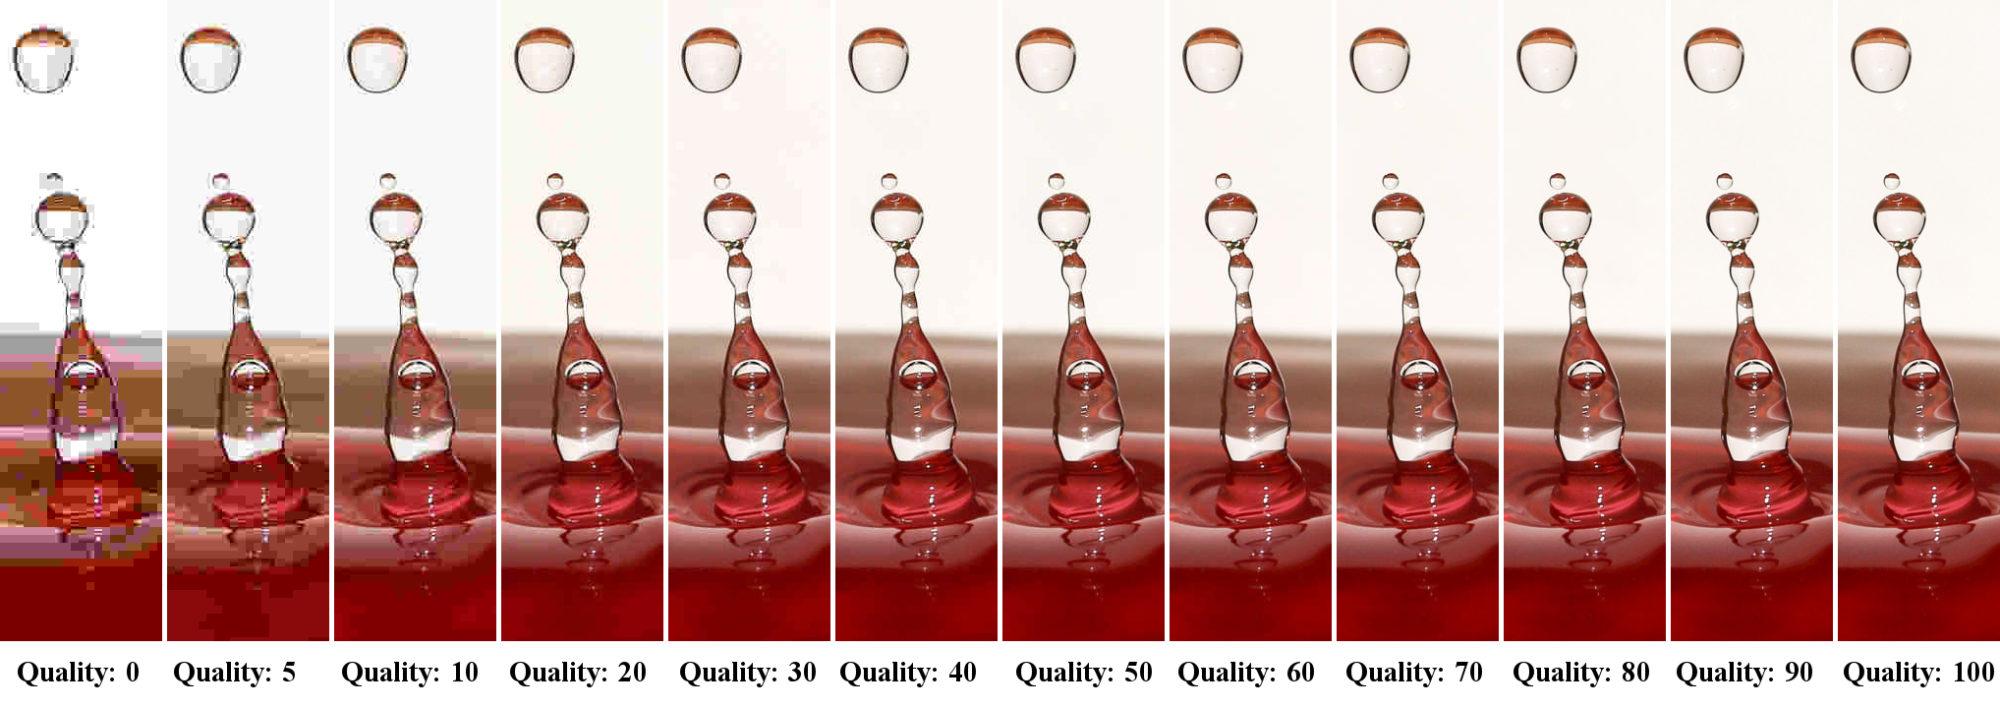 Jpeg Quality Comparison